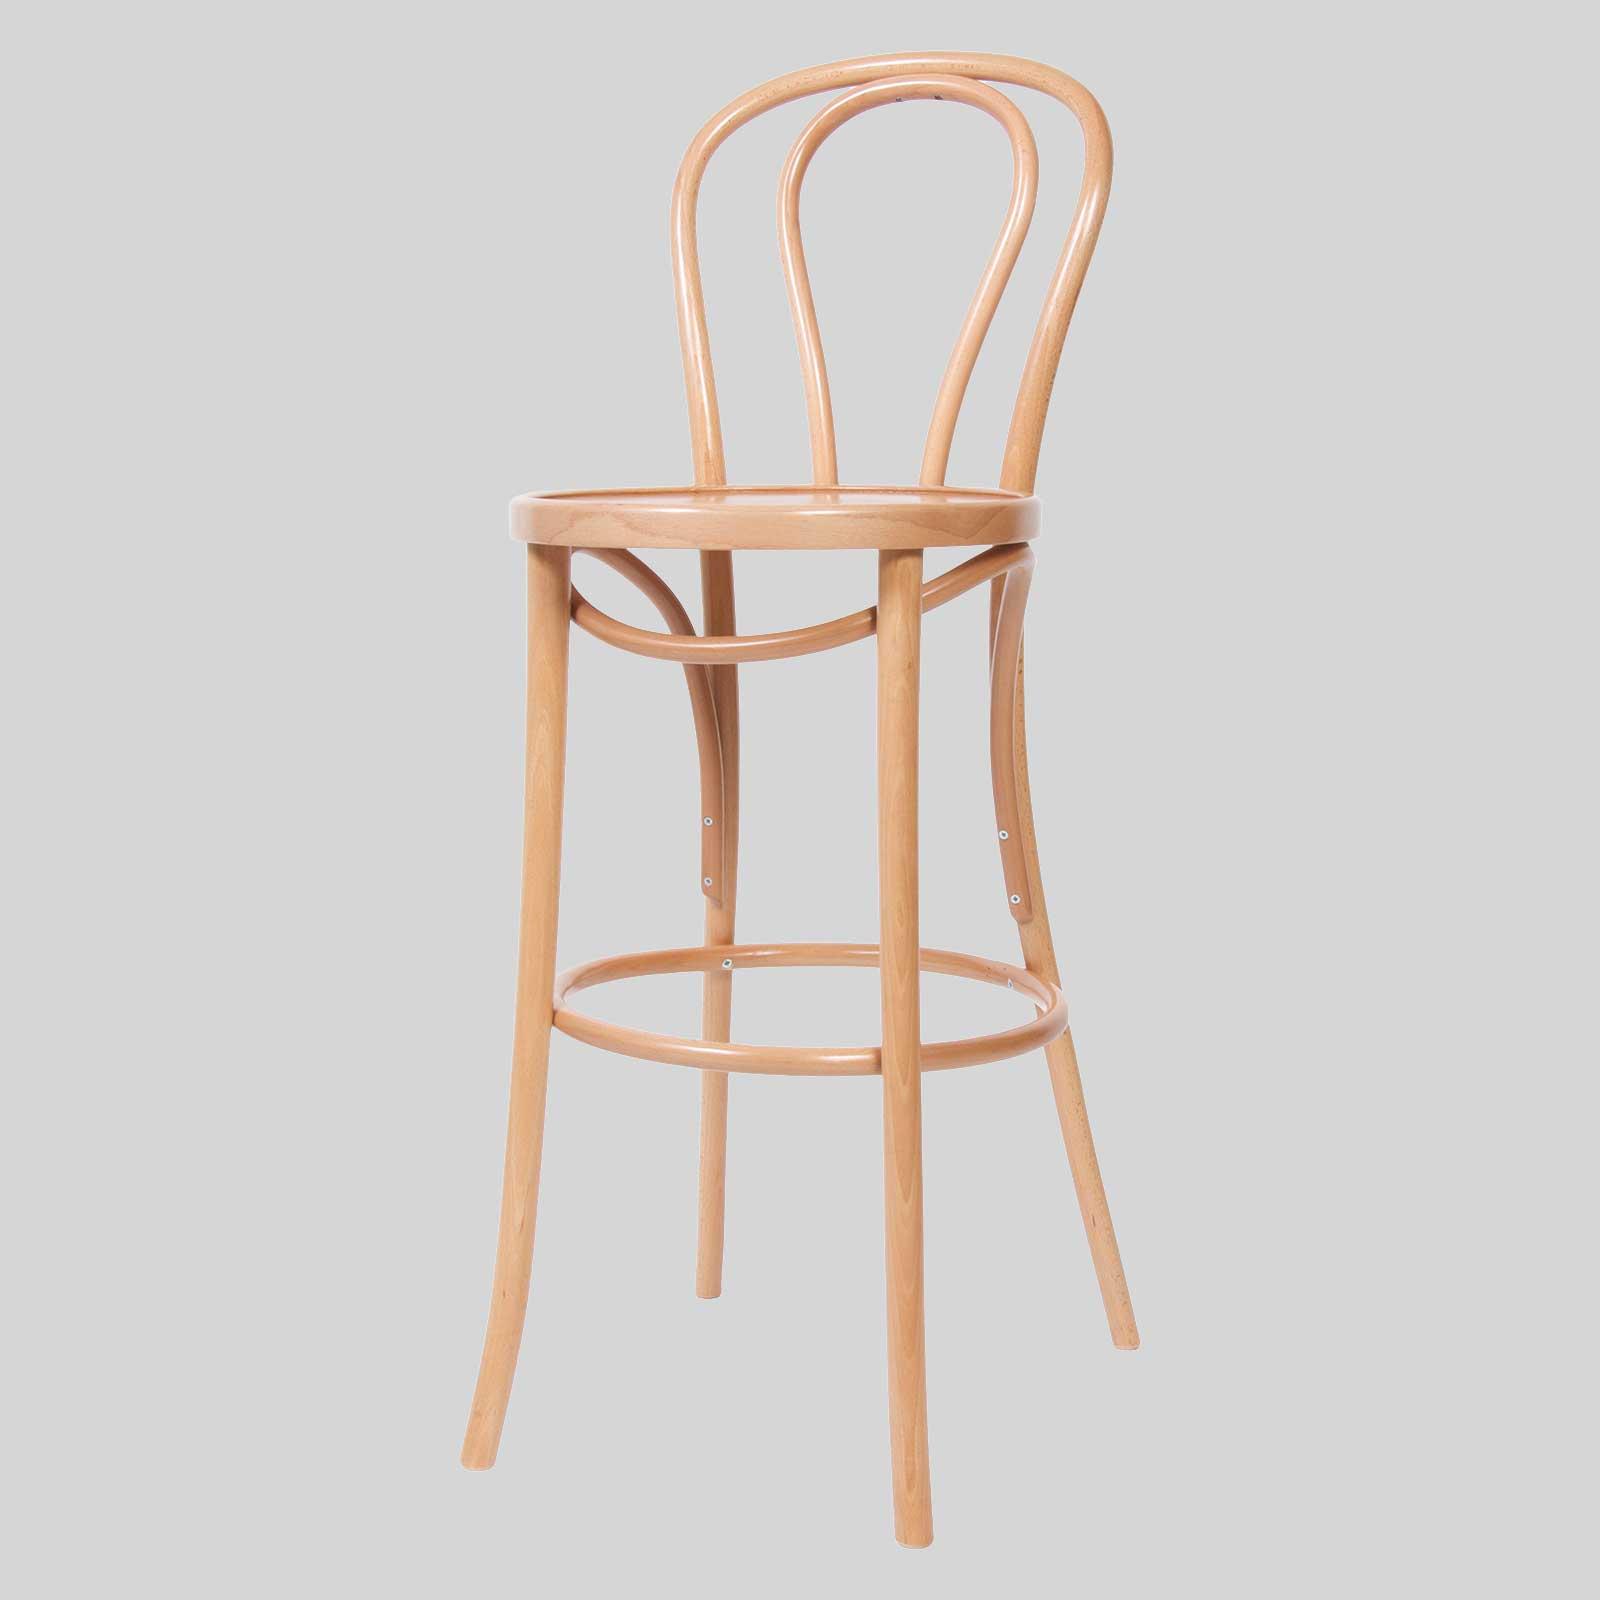 Excellent Bentwood Barstools Classique Concept Collections Creativecarmelina Interior Chair Design Creativecarmelinacom